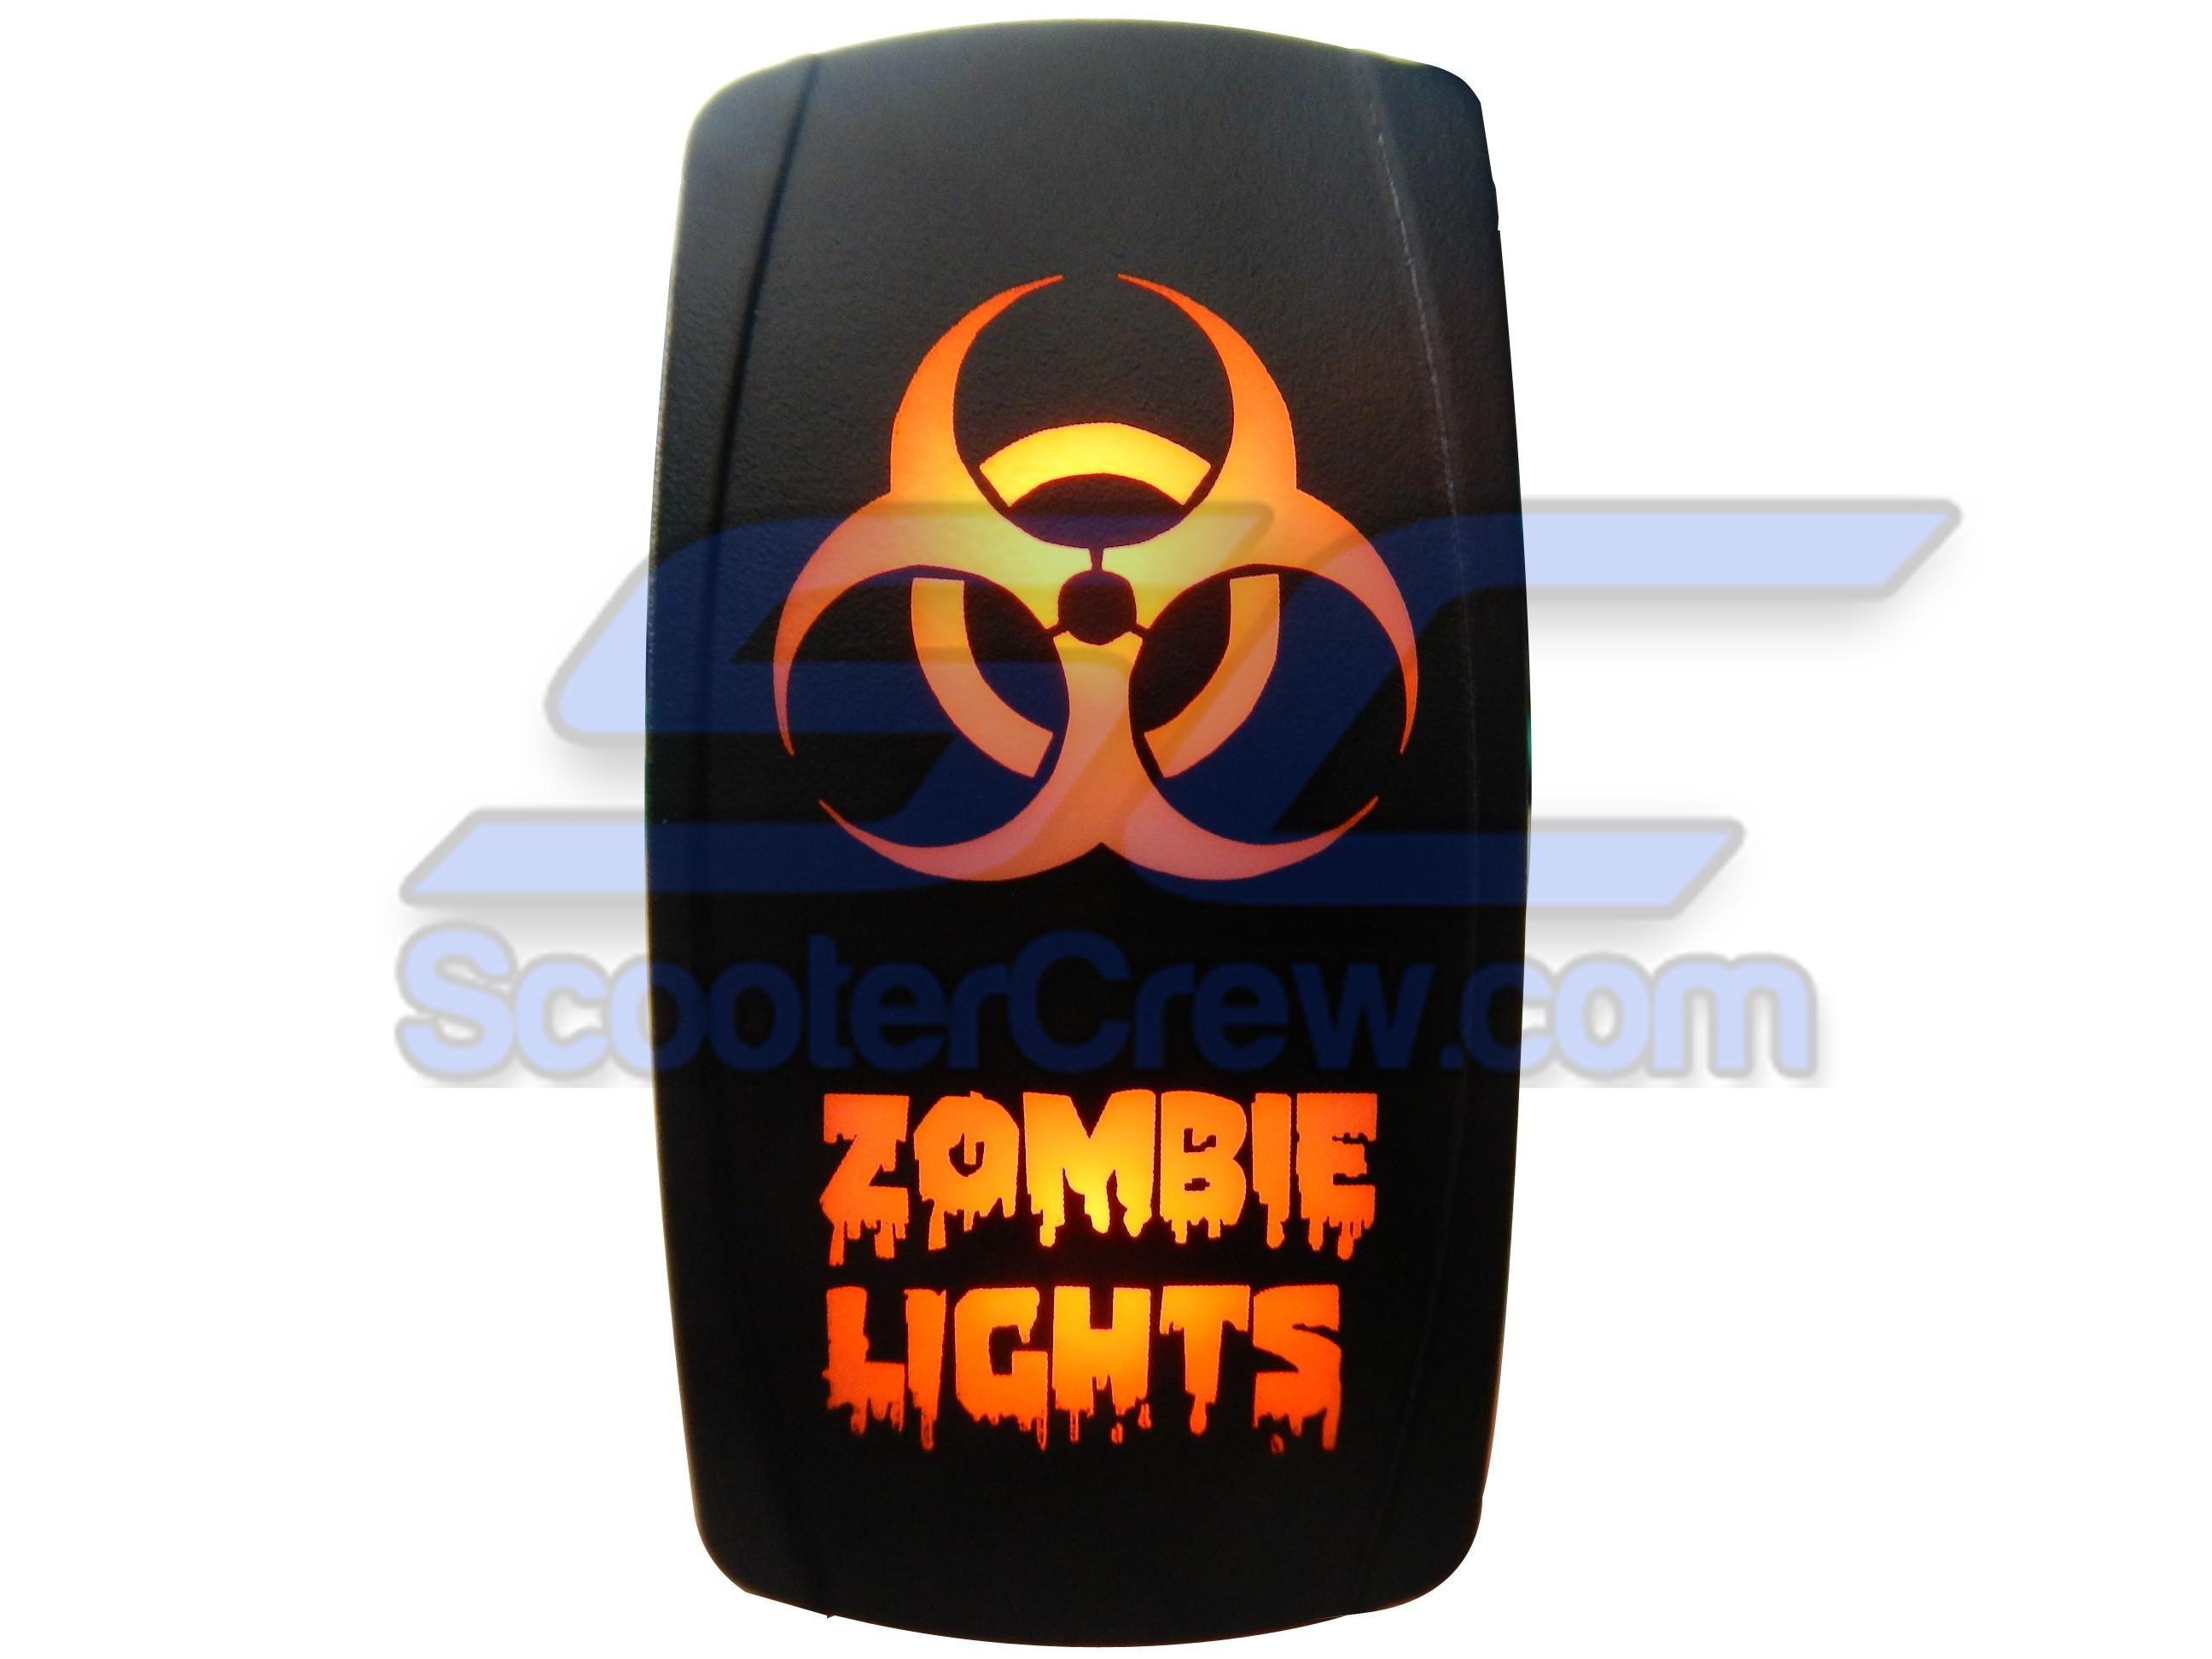 Orange Zombie Lights Rocker Switch 101O Zombie Lights 101O